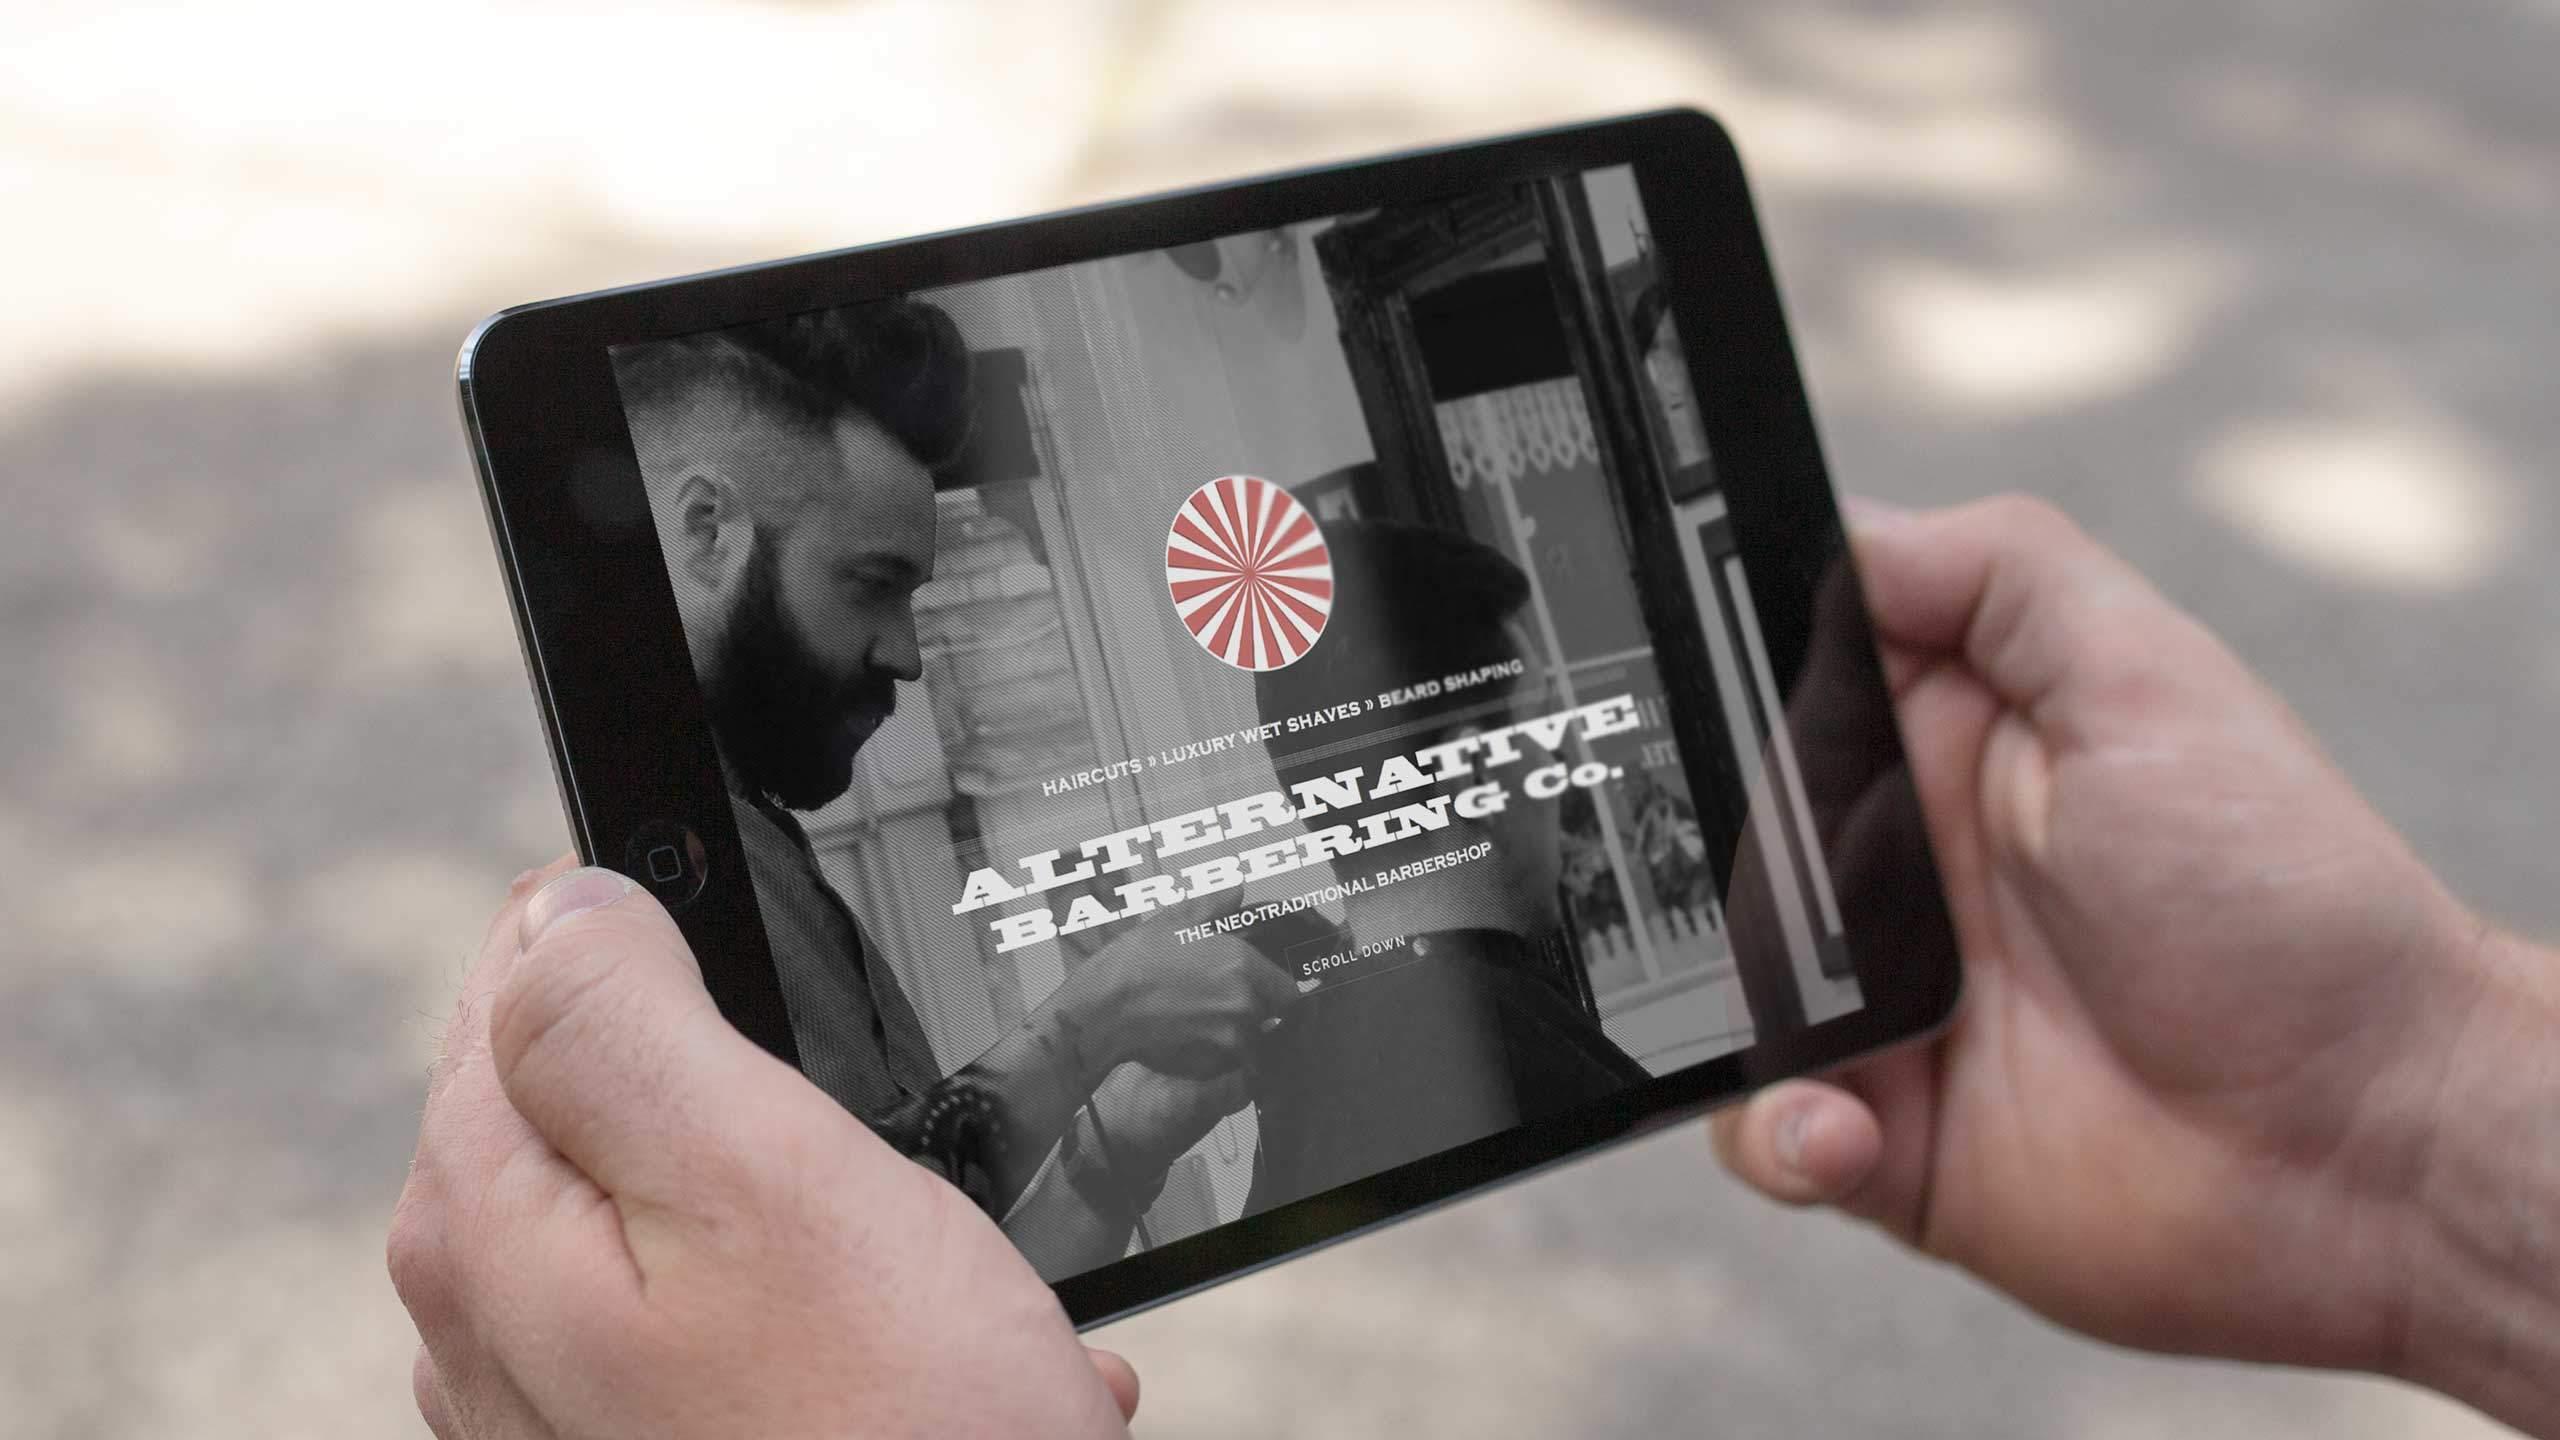 barbershop branding home page ipad alternative barbering co